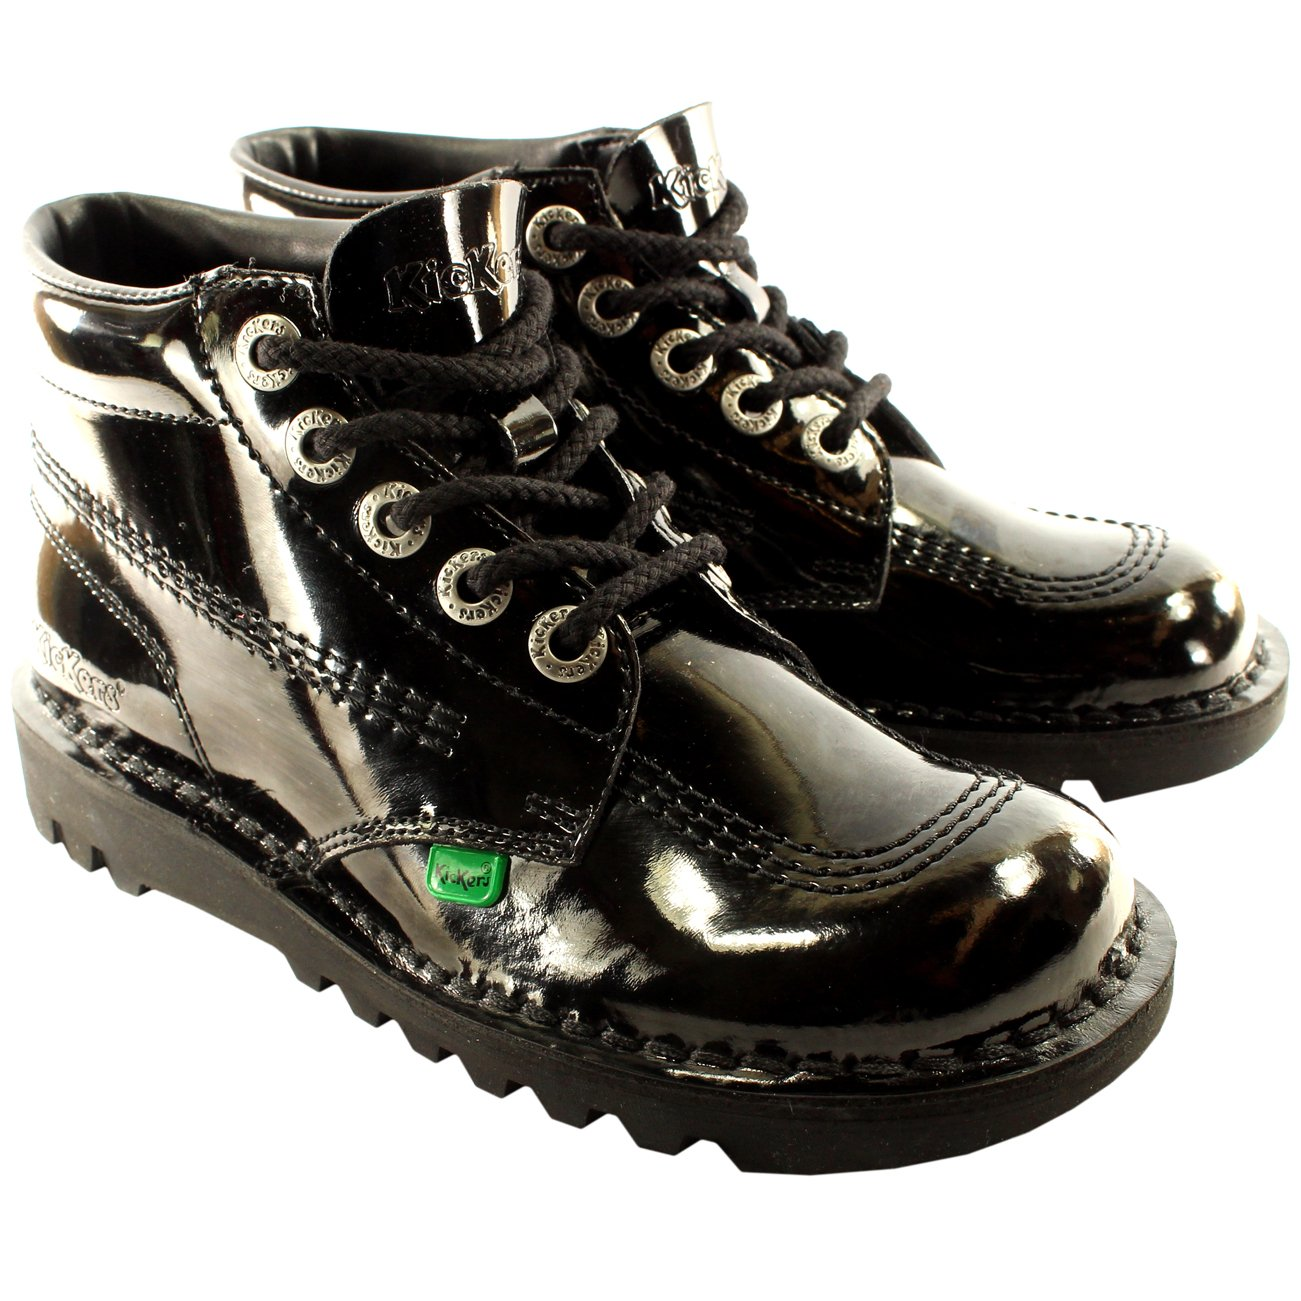 Kickers Unisex Kids Youth Kick Hi Black Patent Back To School Boots Shoes - Black - 5.5